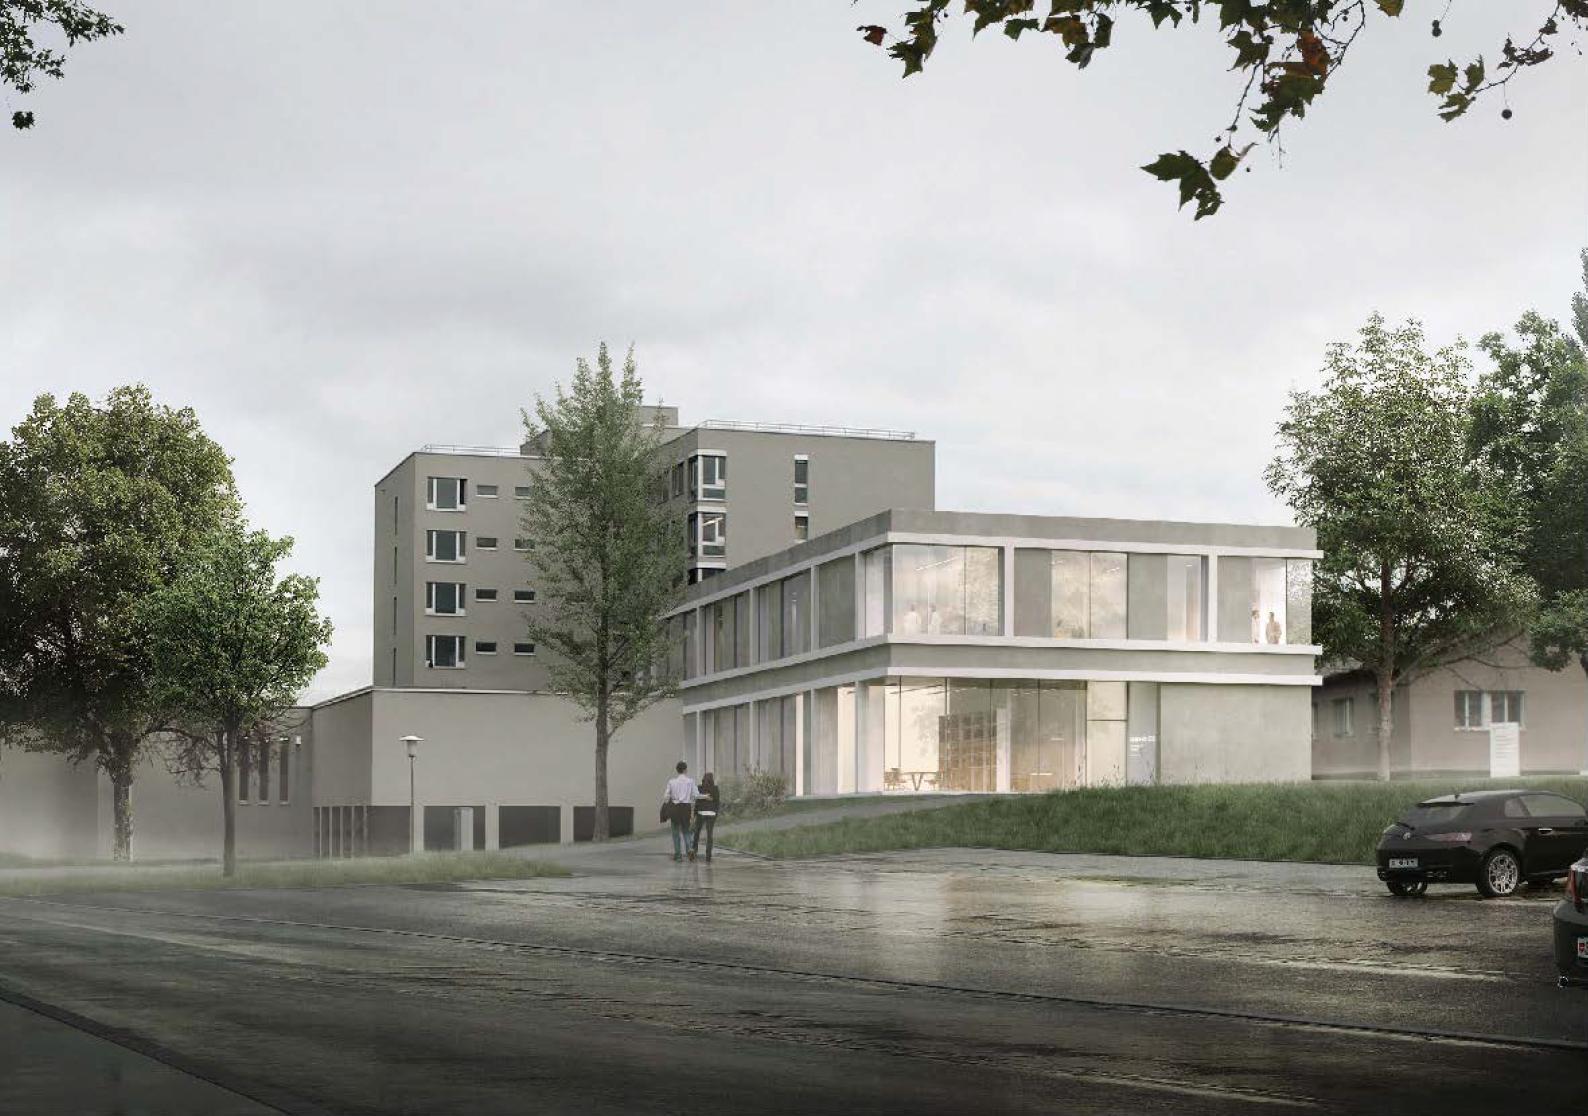 Kantonsspital Münsterlingen, Pathologie (PathoE3), Nickl & Partner Architekten / Steiner AG